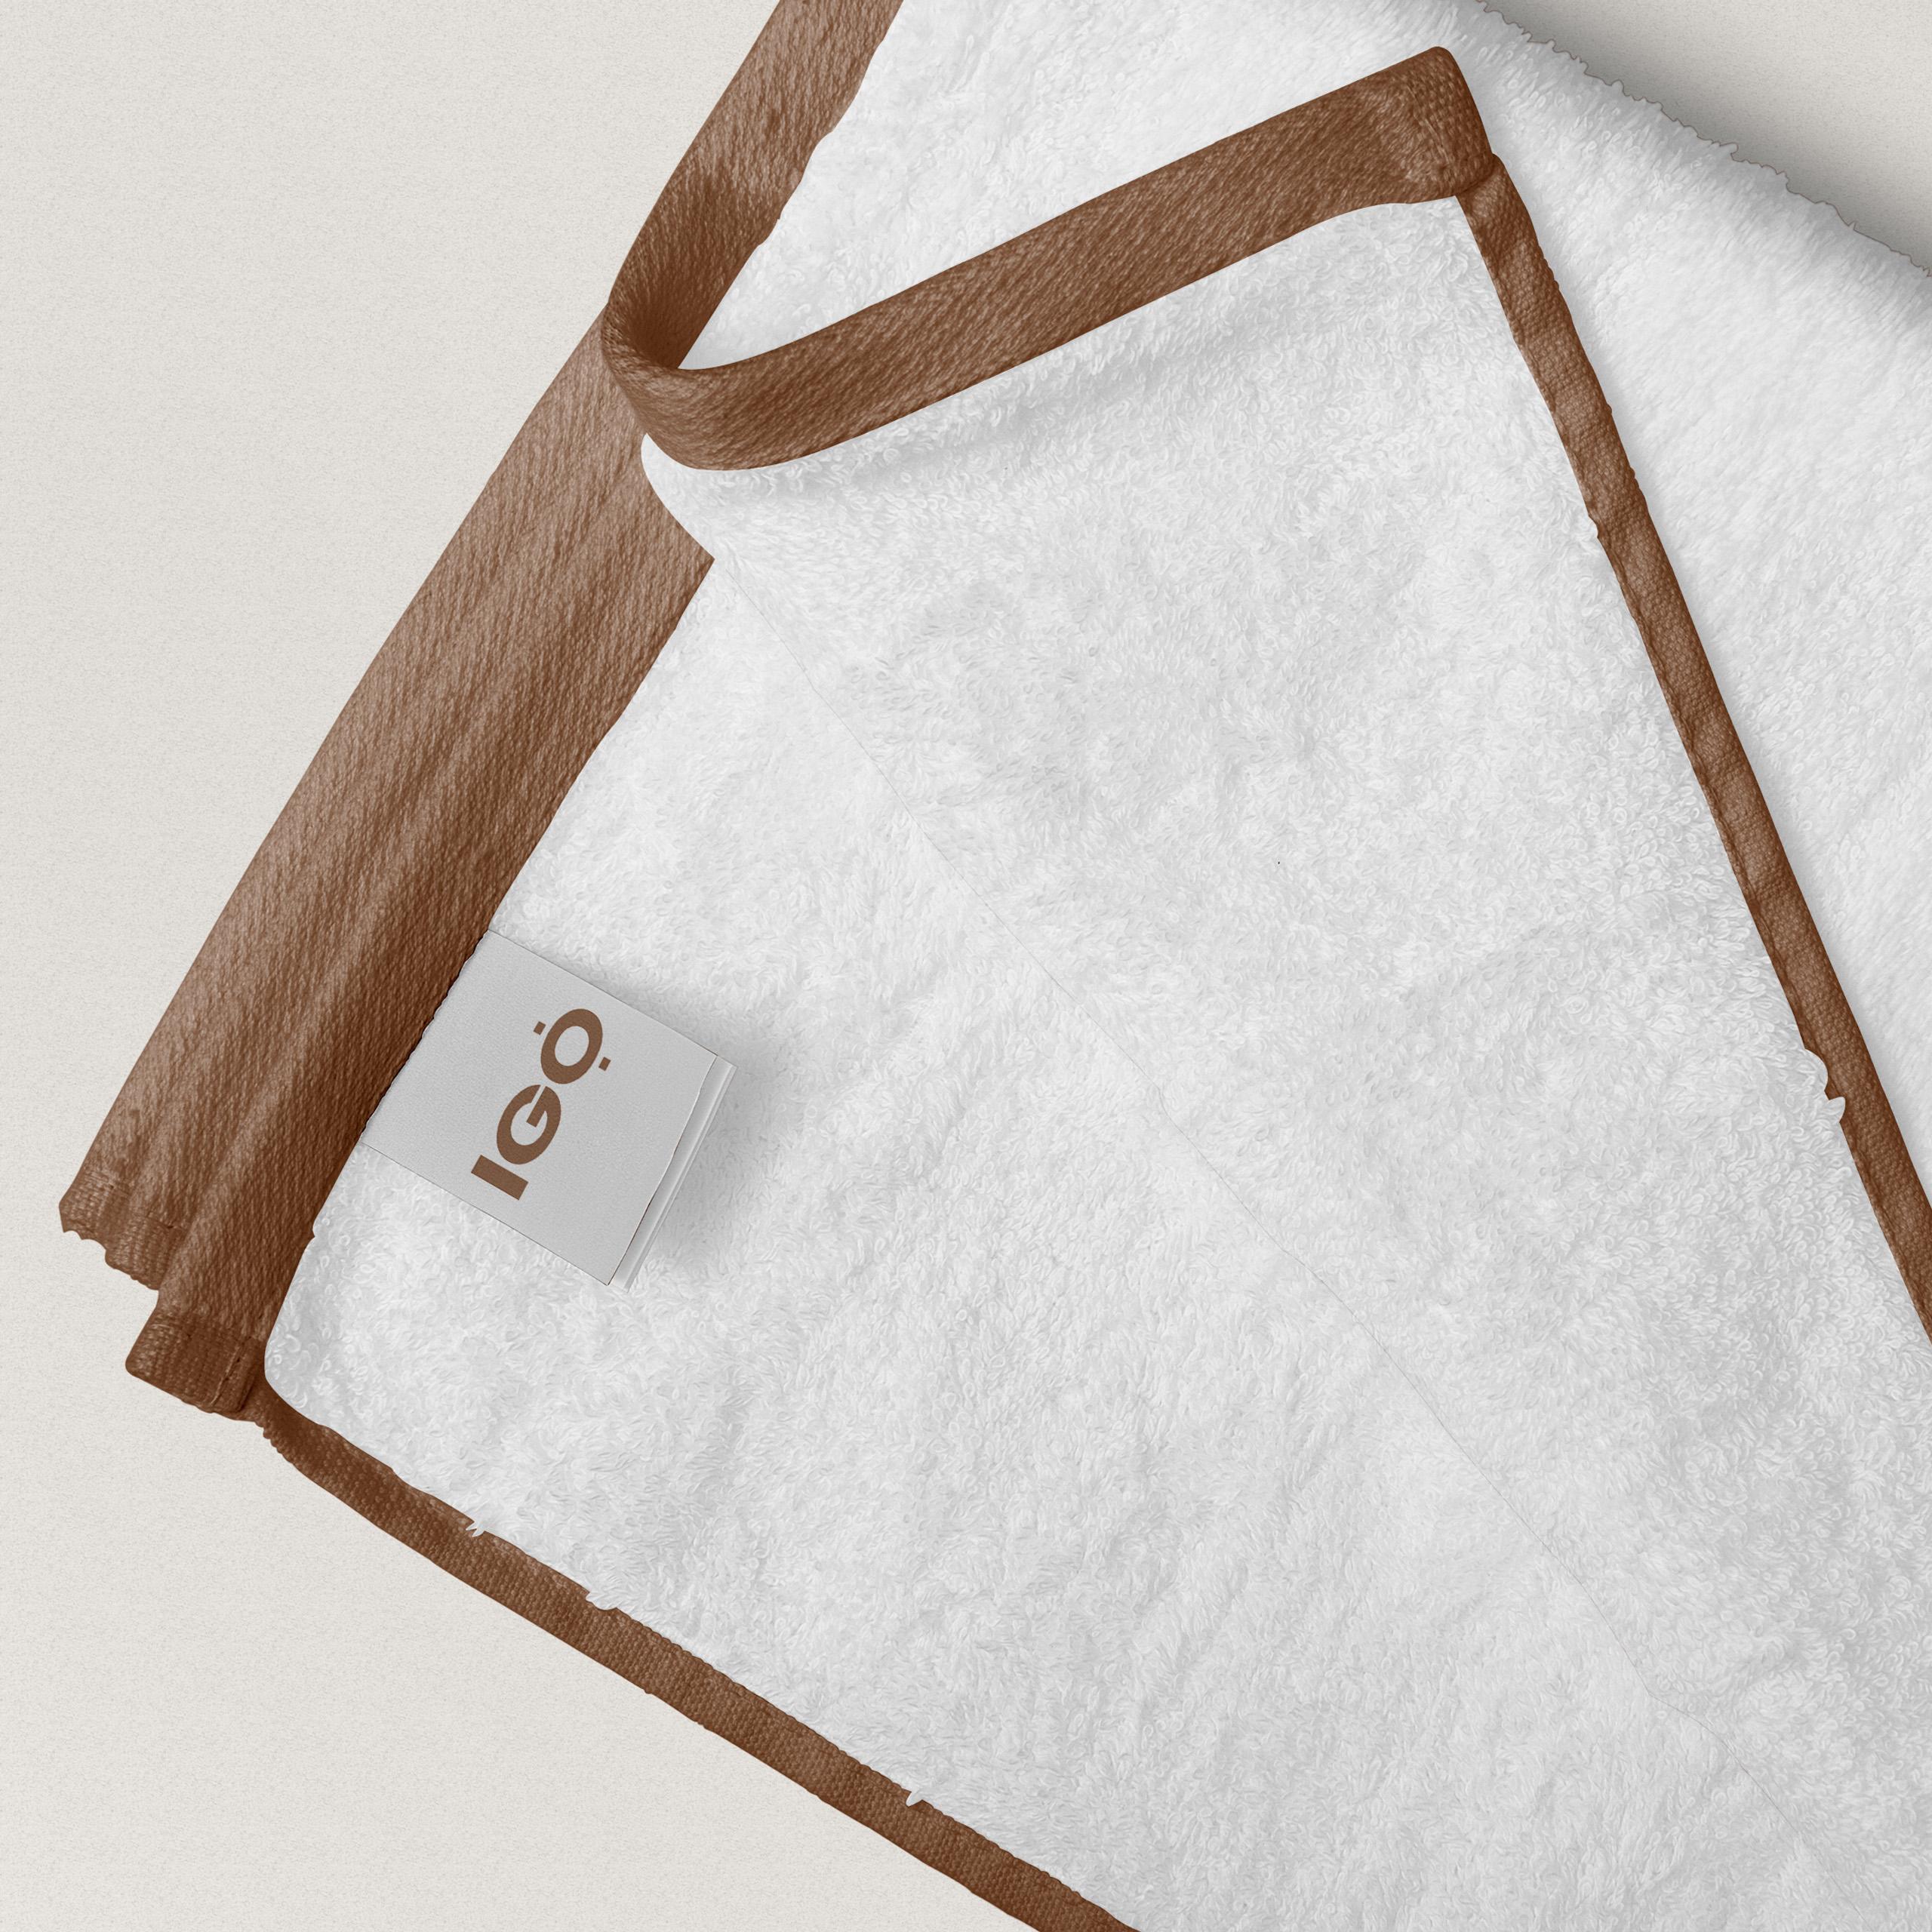 IGO Laser Skin Project Img 22 - Vatra Agency / Founder & CEO Gerton Bejo